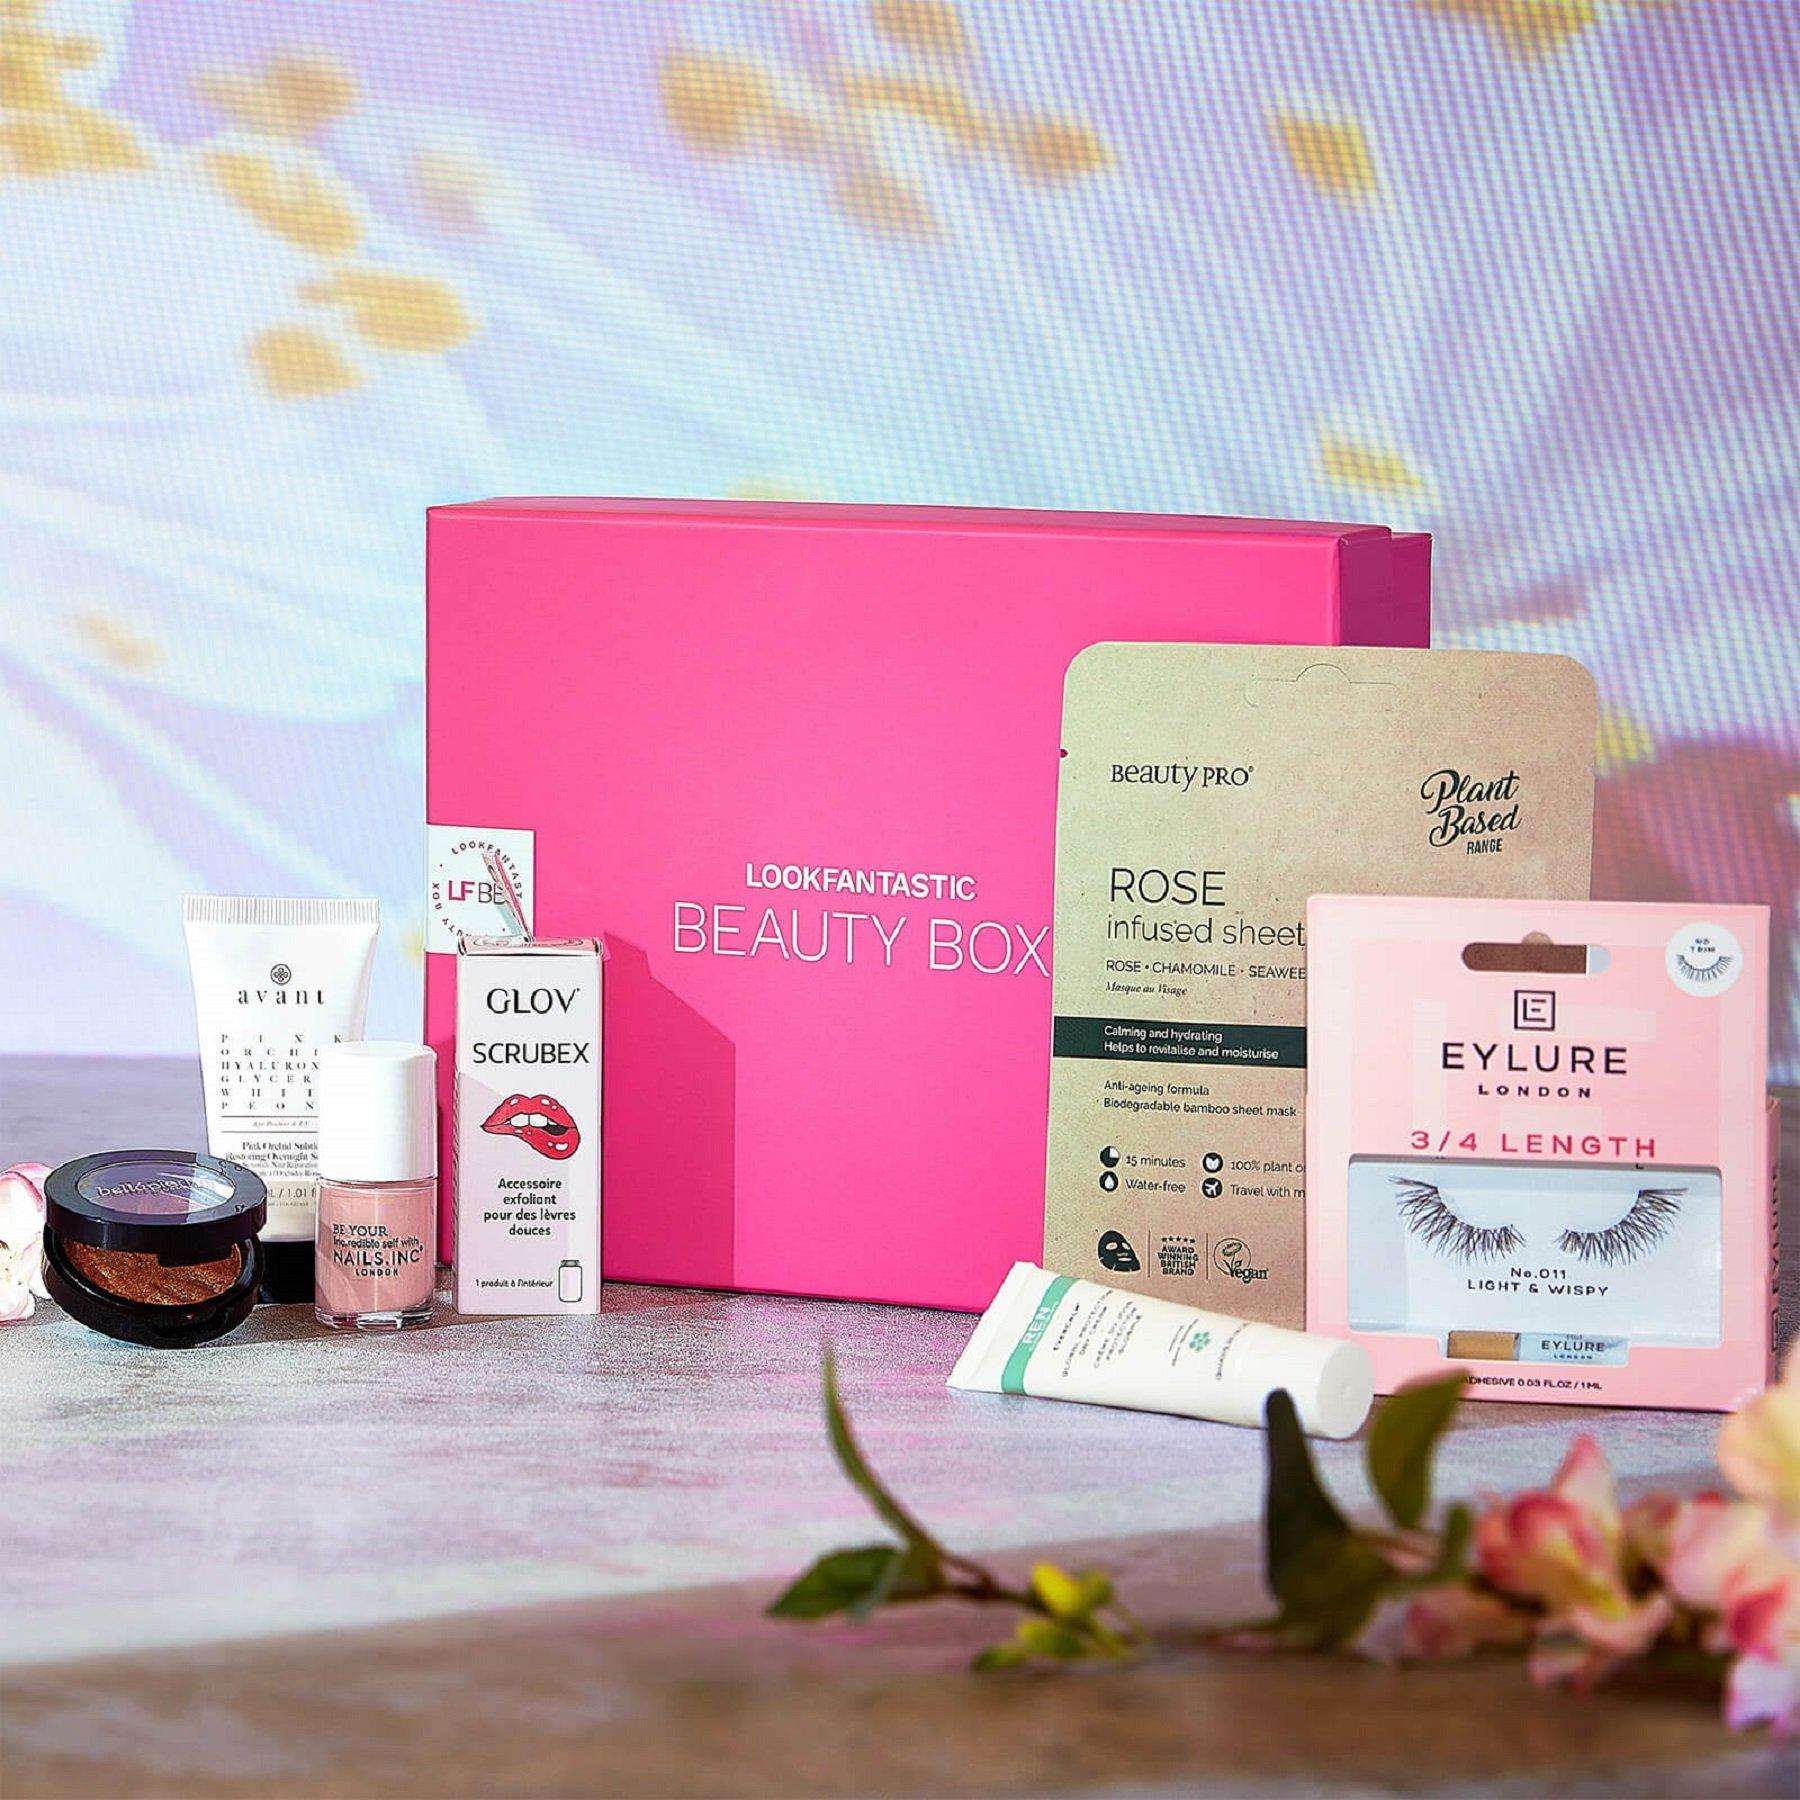 Discover April 'Blossom' Edition LOOKFANTASTIC Beauty Box